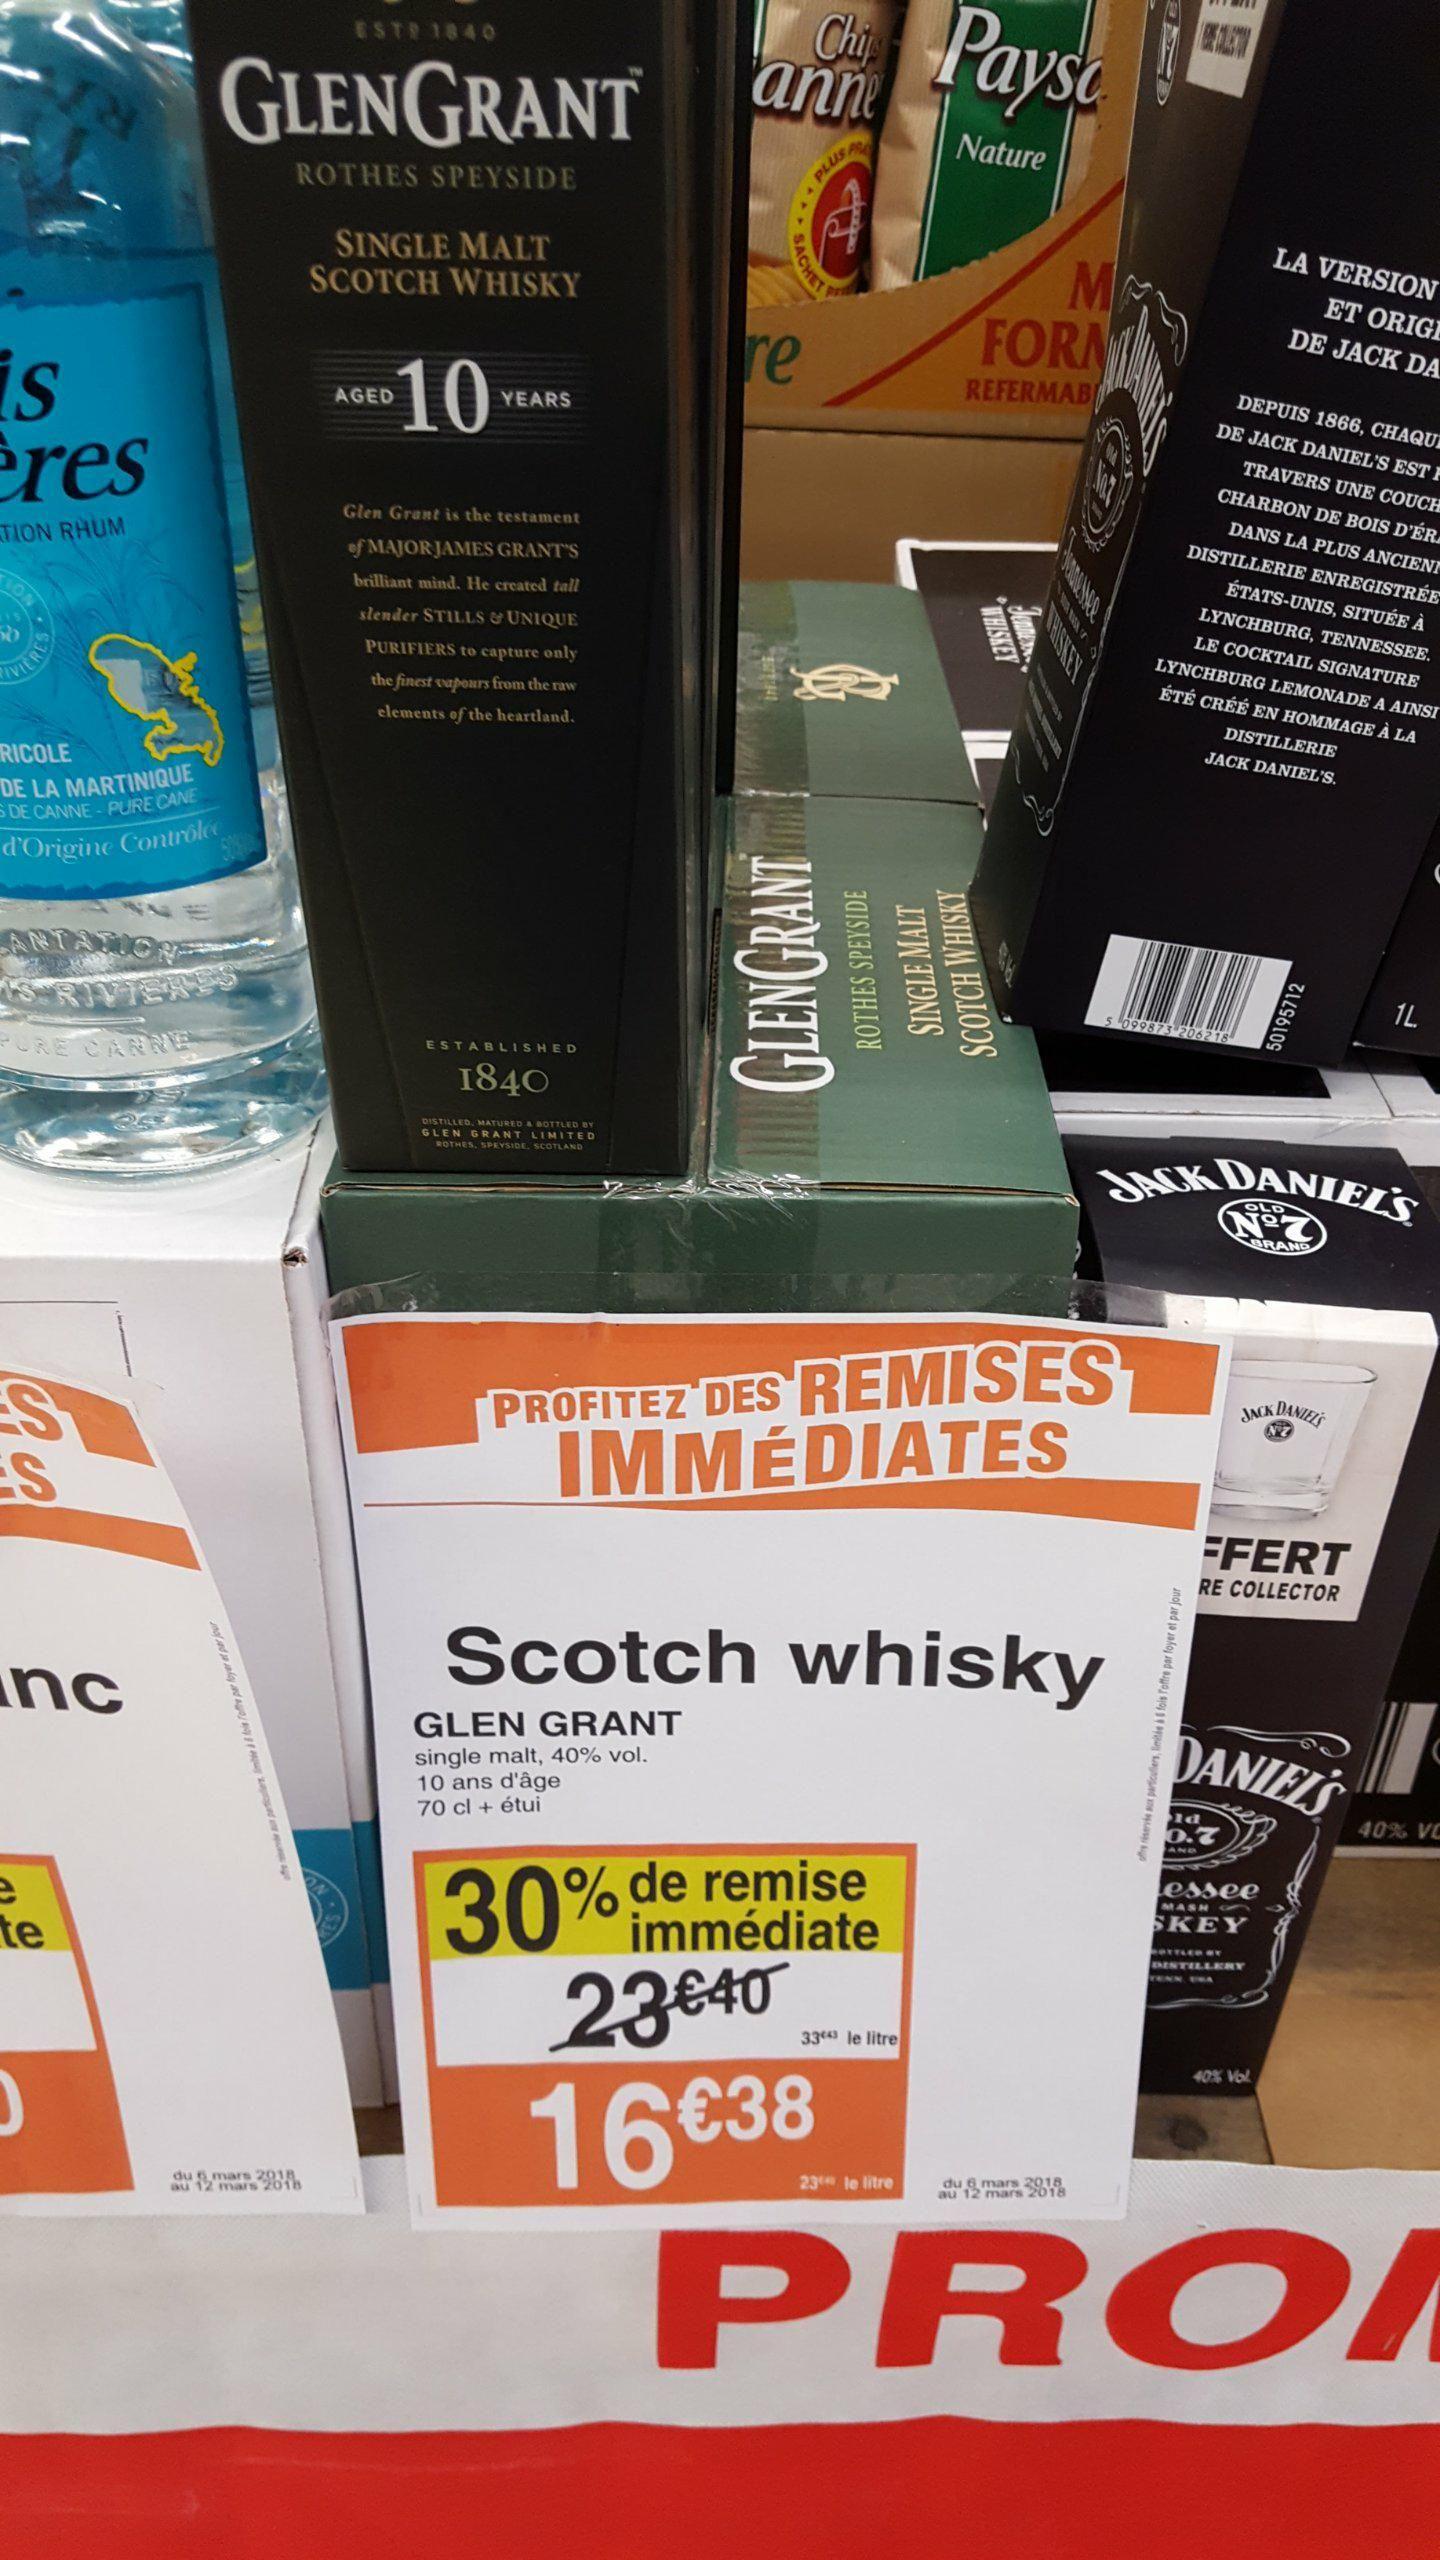 Bouteille de whisky GlenGrant - 10 ans d'âge, 70 cl - Houdemont (54)